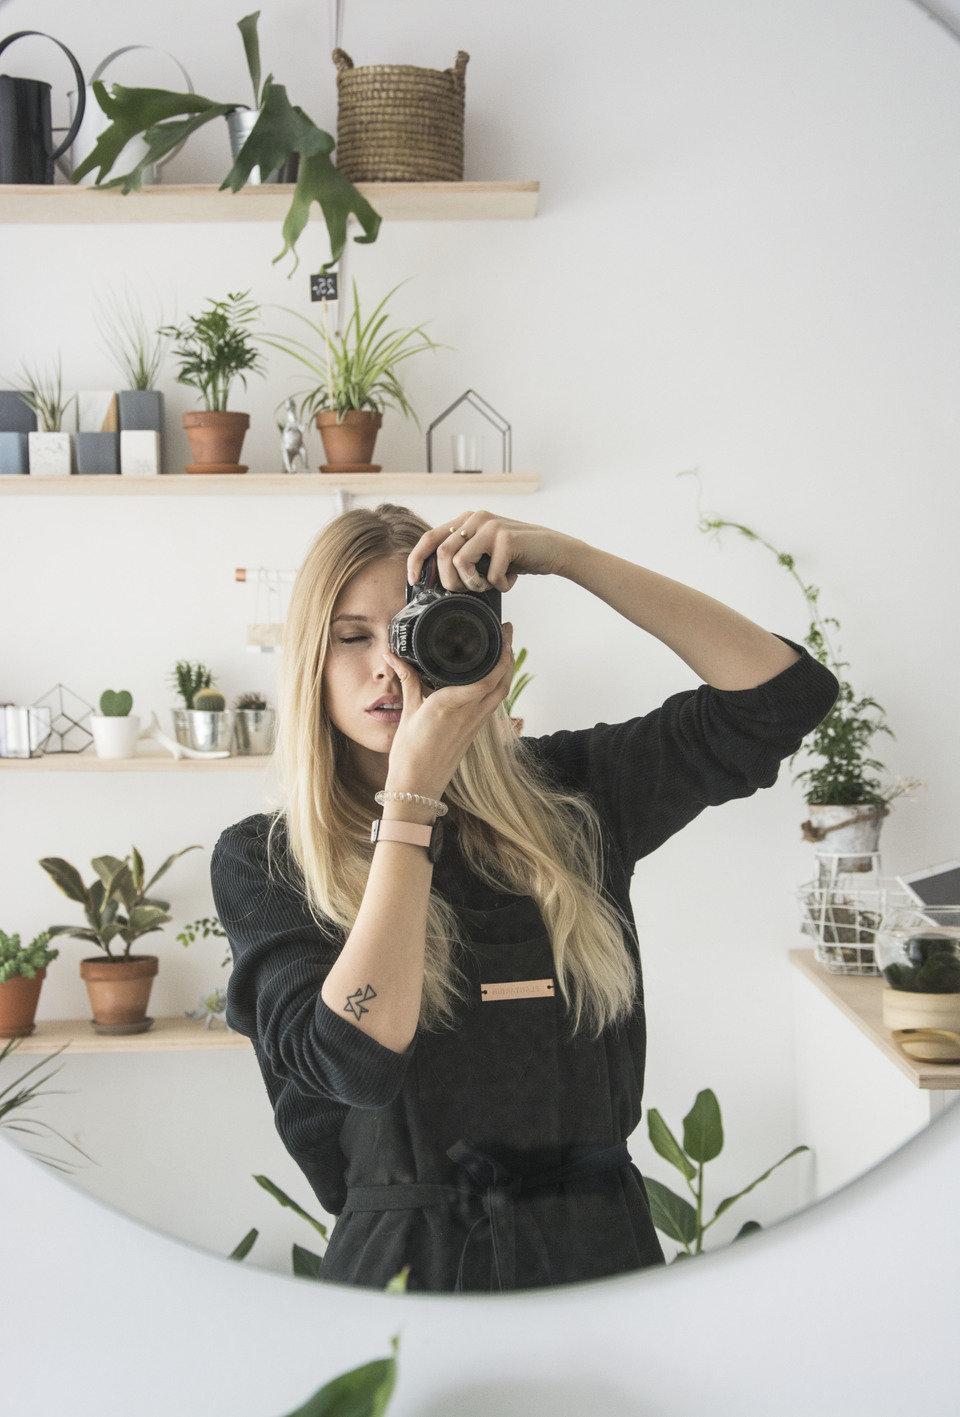 Kamila Ciszek - Plantarium